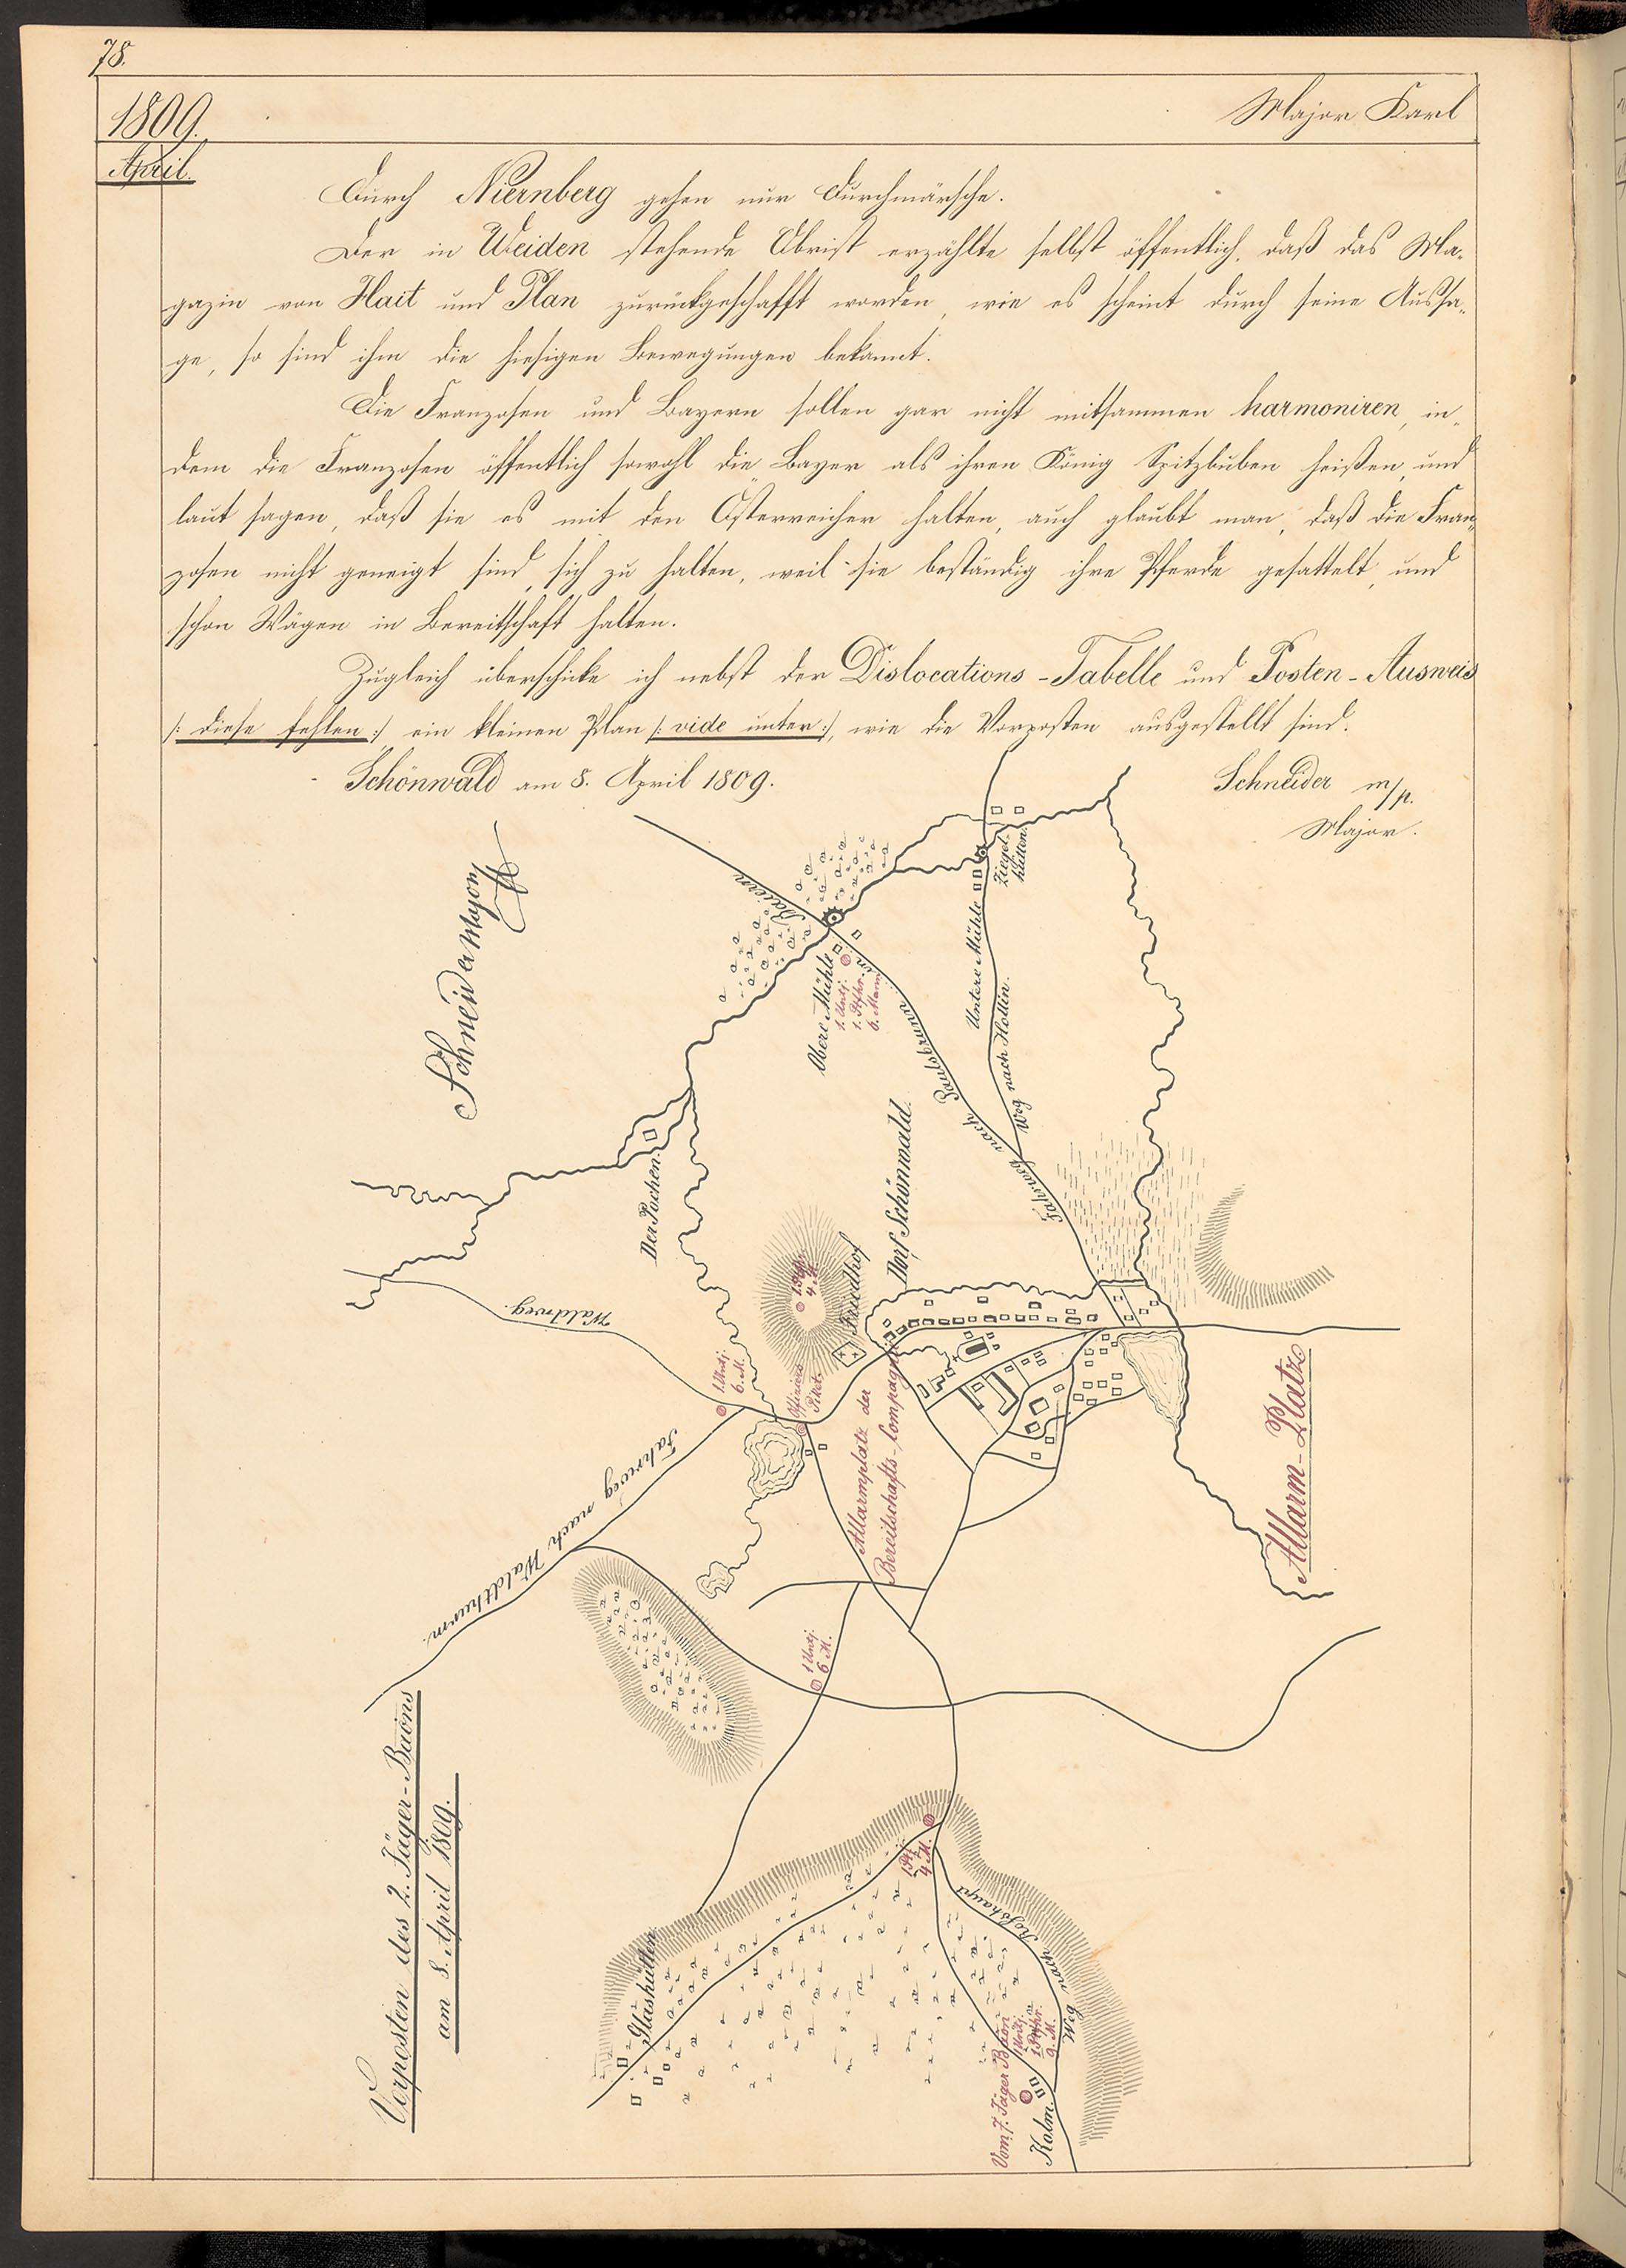 Anton Mudroch: Geschichte des k. k. 2ten Feld Jäger Bataillons (1808-1863)